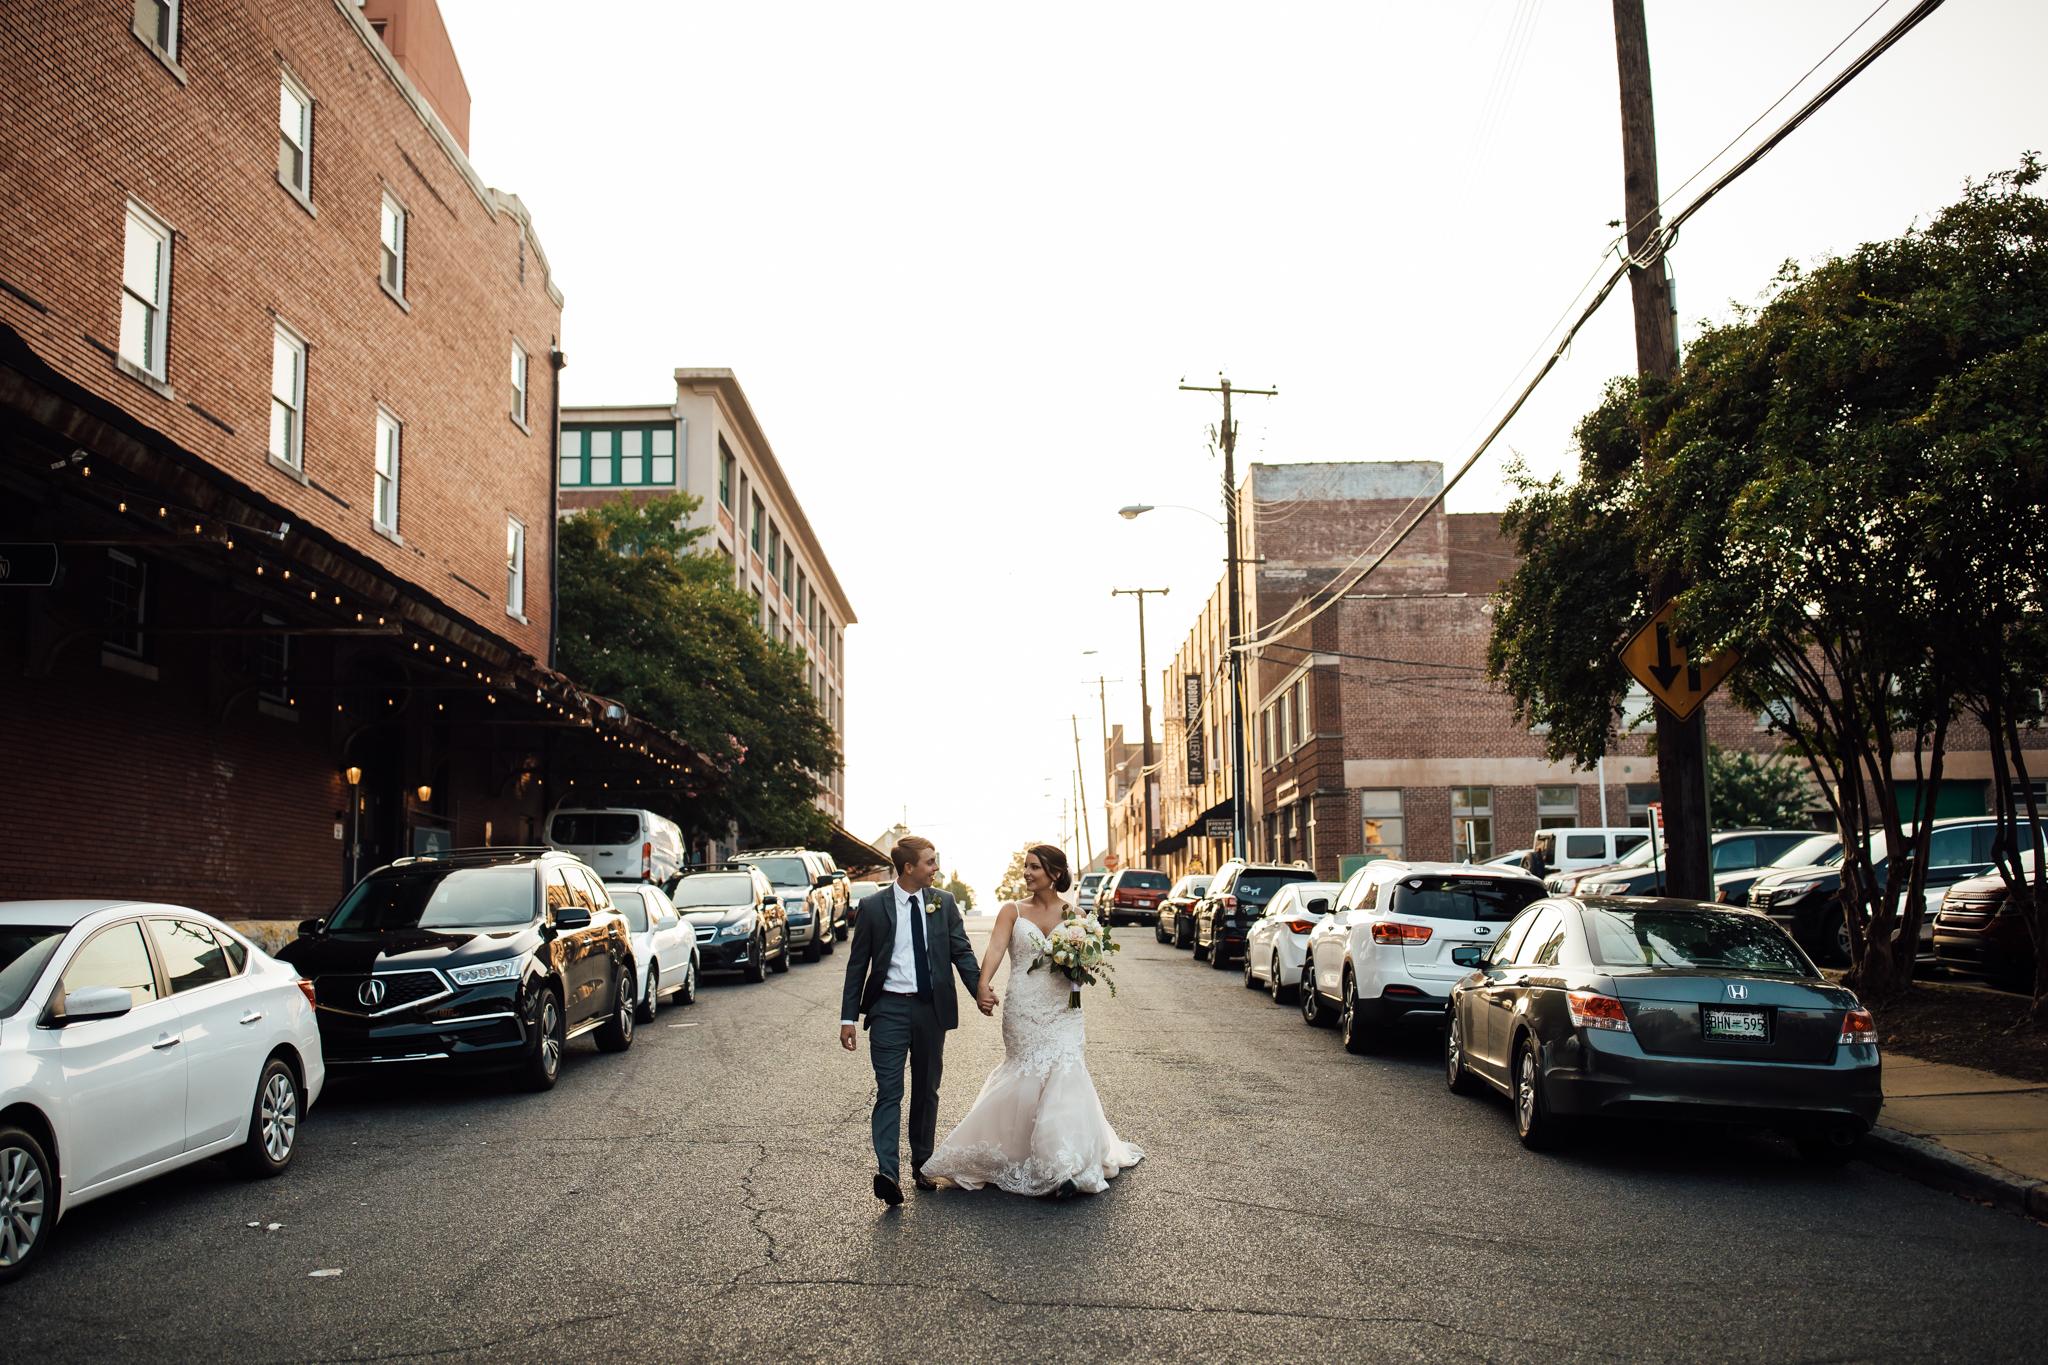 409smain-downtown-memphis-wedding-venue-thewarmtharoundyou (114 of 243).jpg